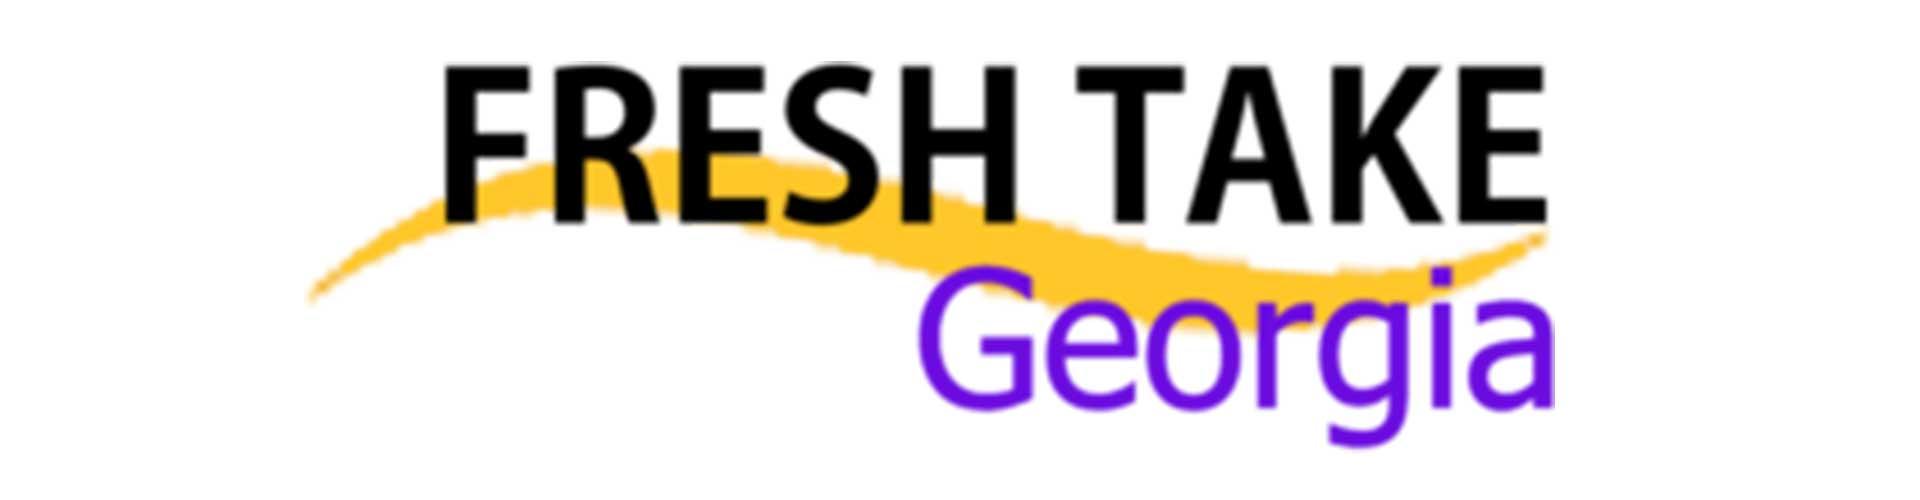 Fresh Take Georgia